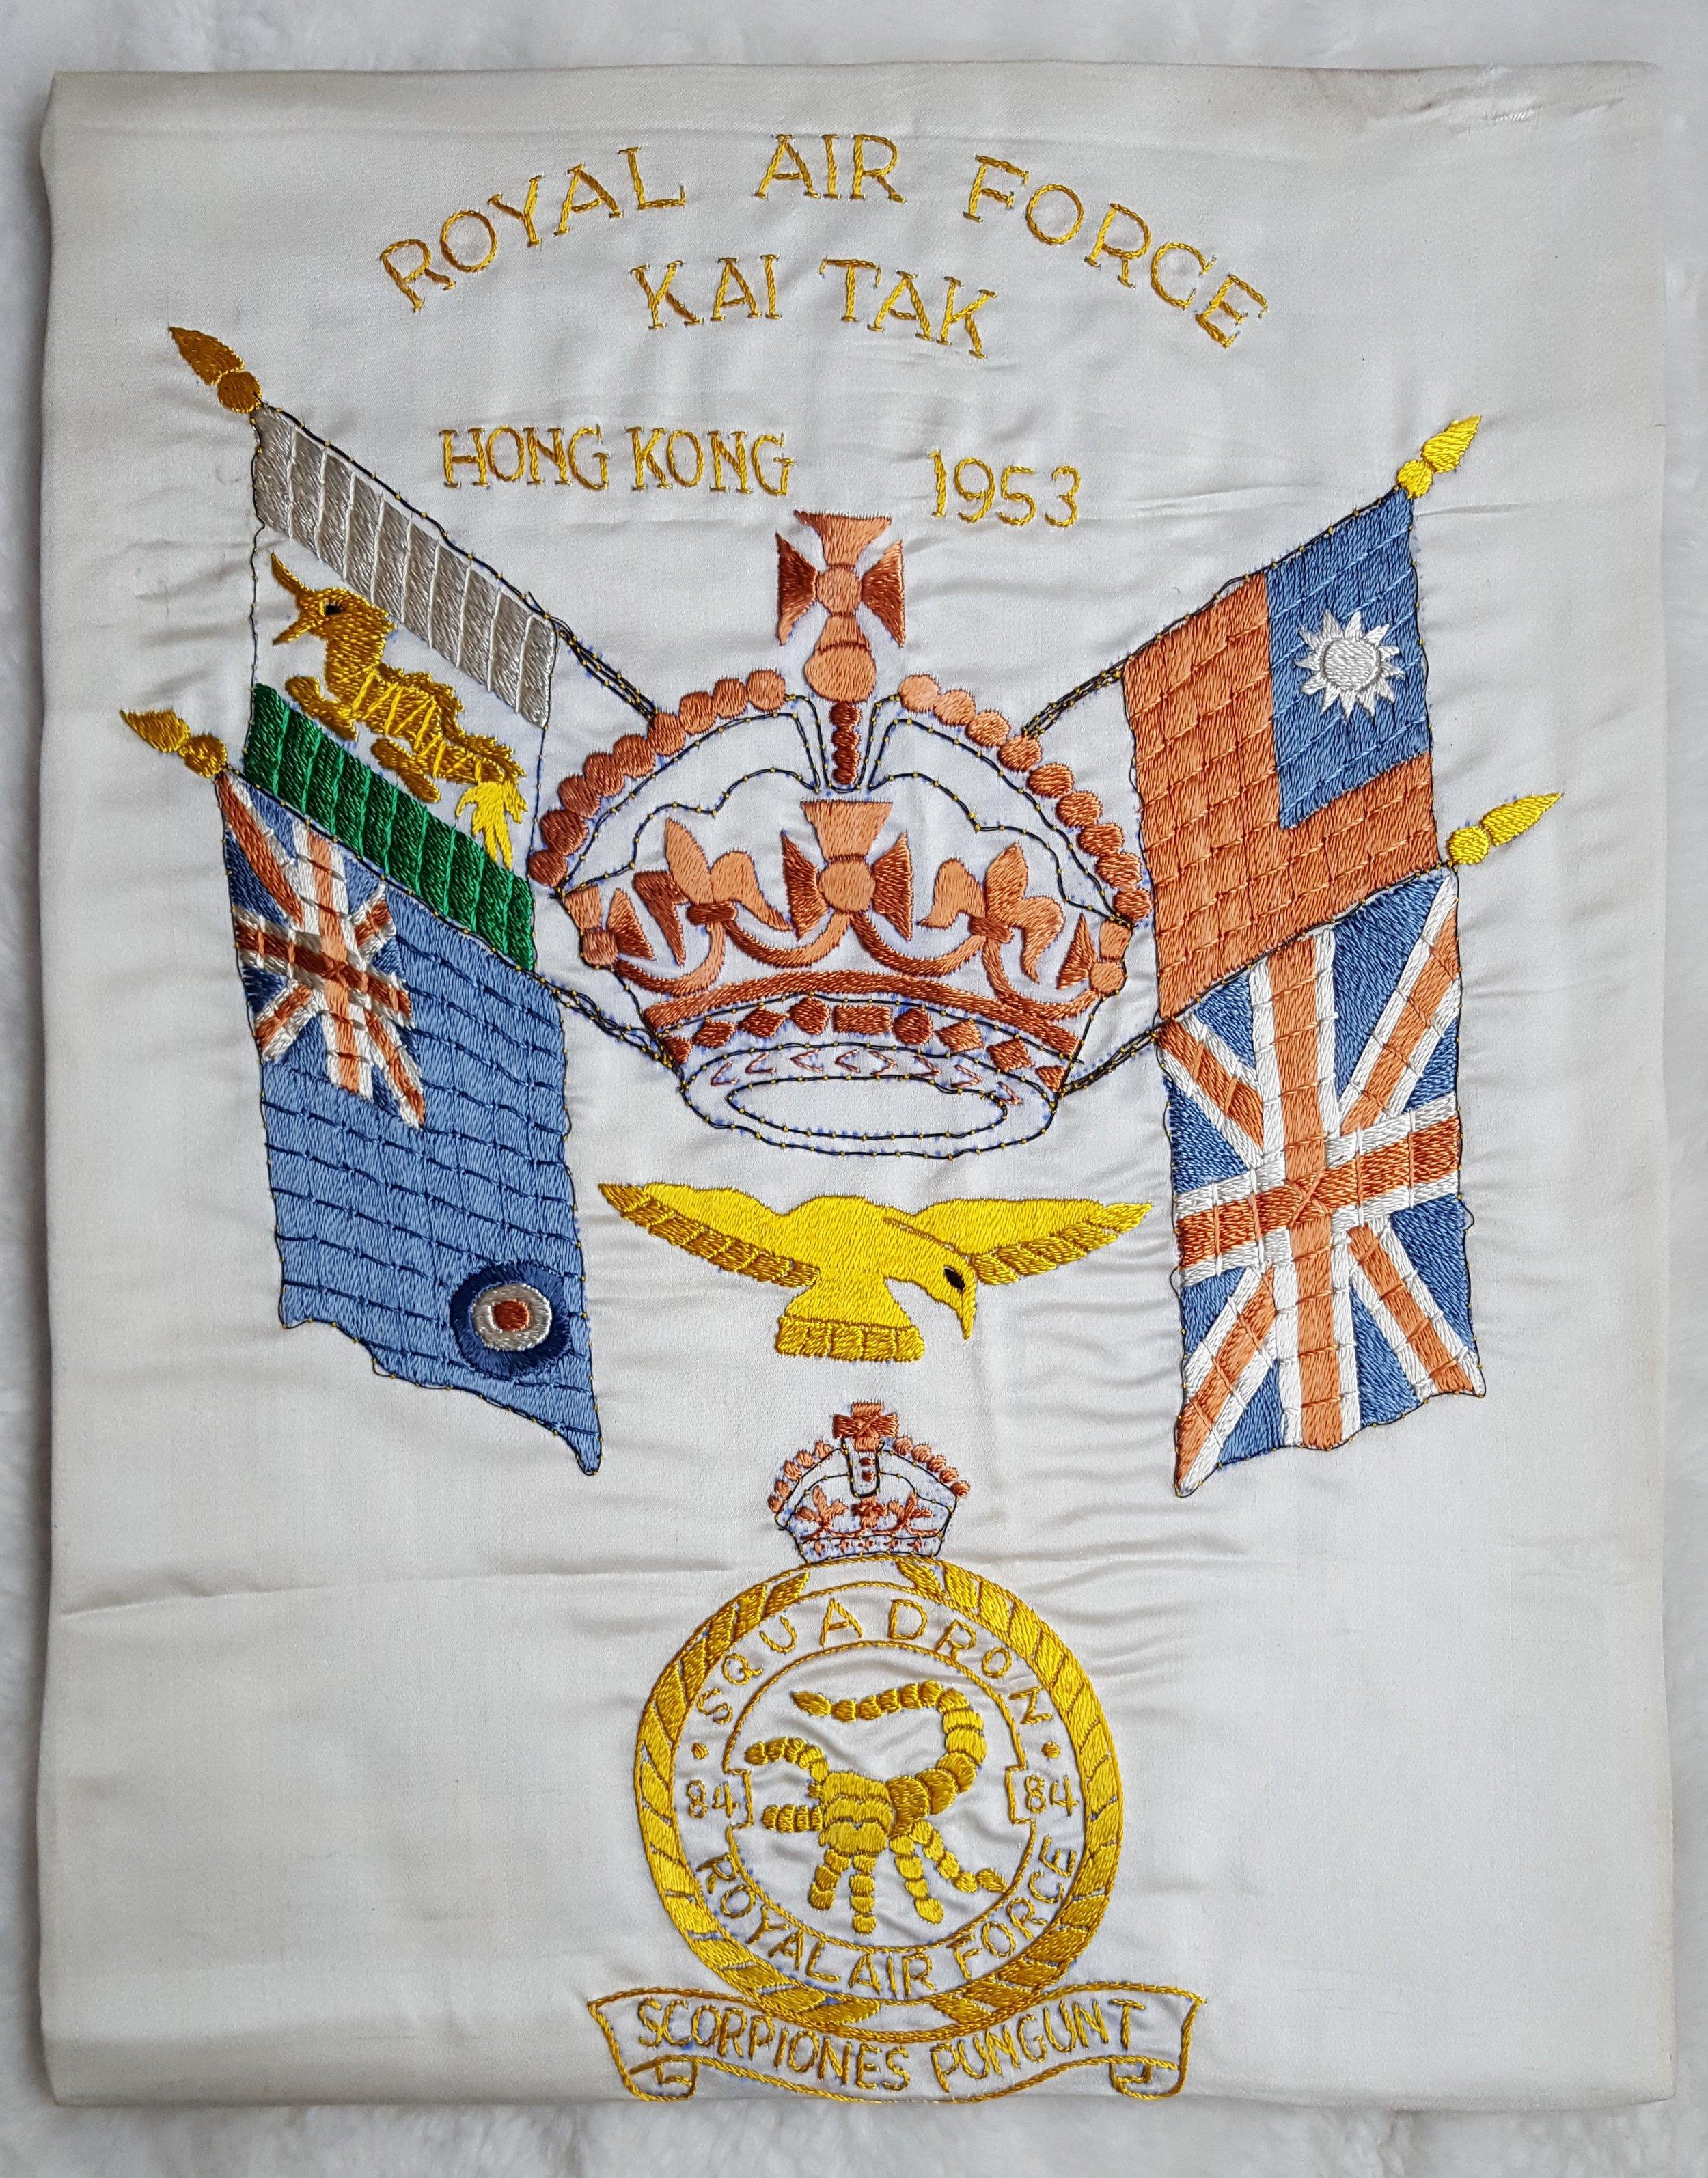 R.A.F. Squadron 84 Silk / Pennant.